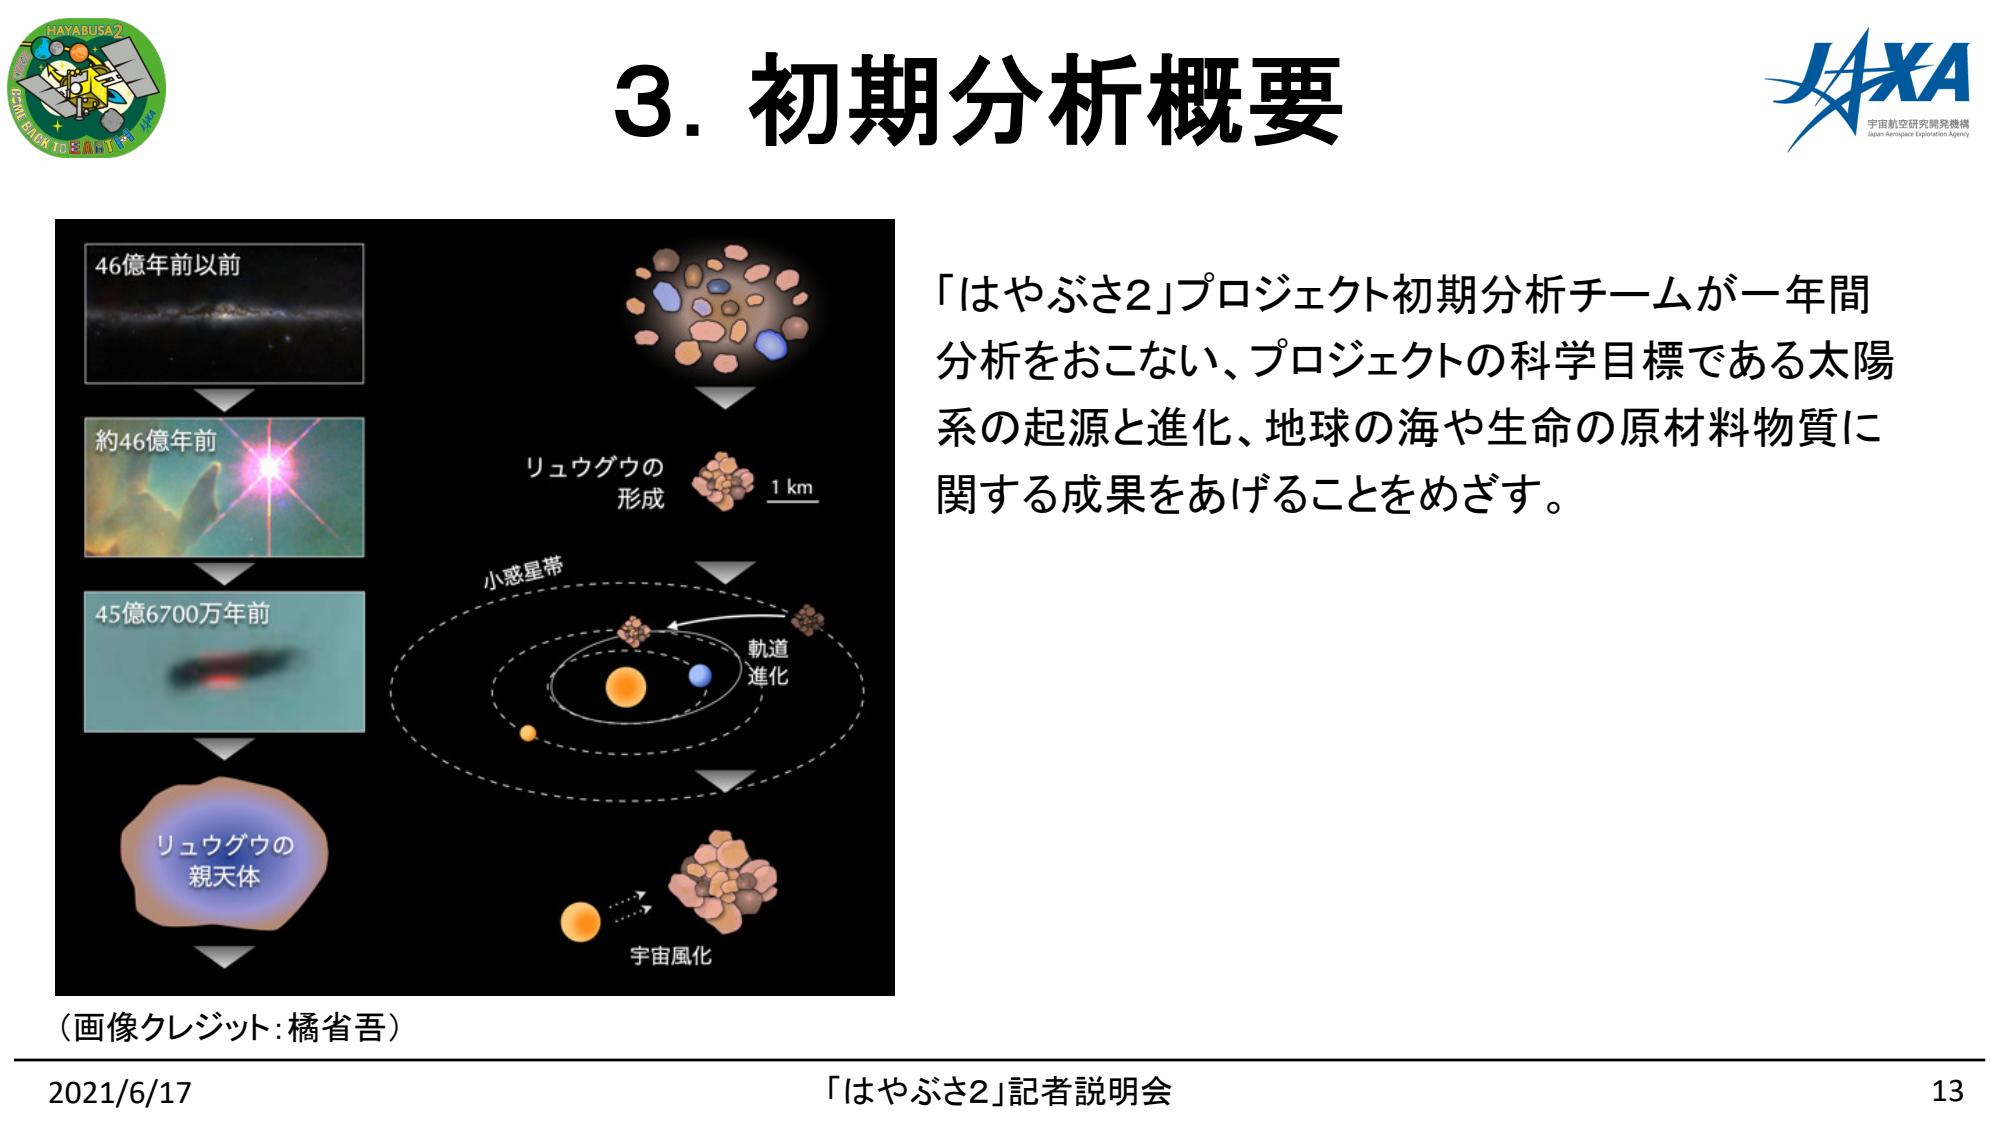 f:id:Imamura:20210617130234p:plain